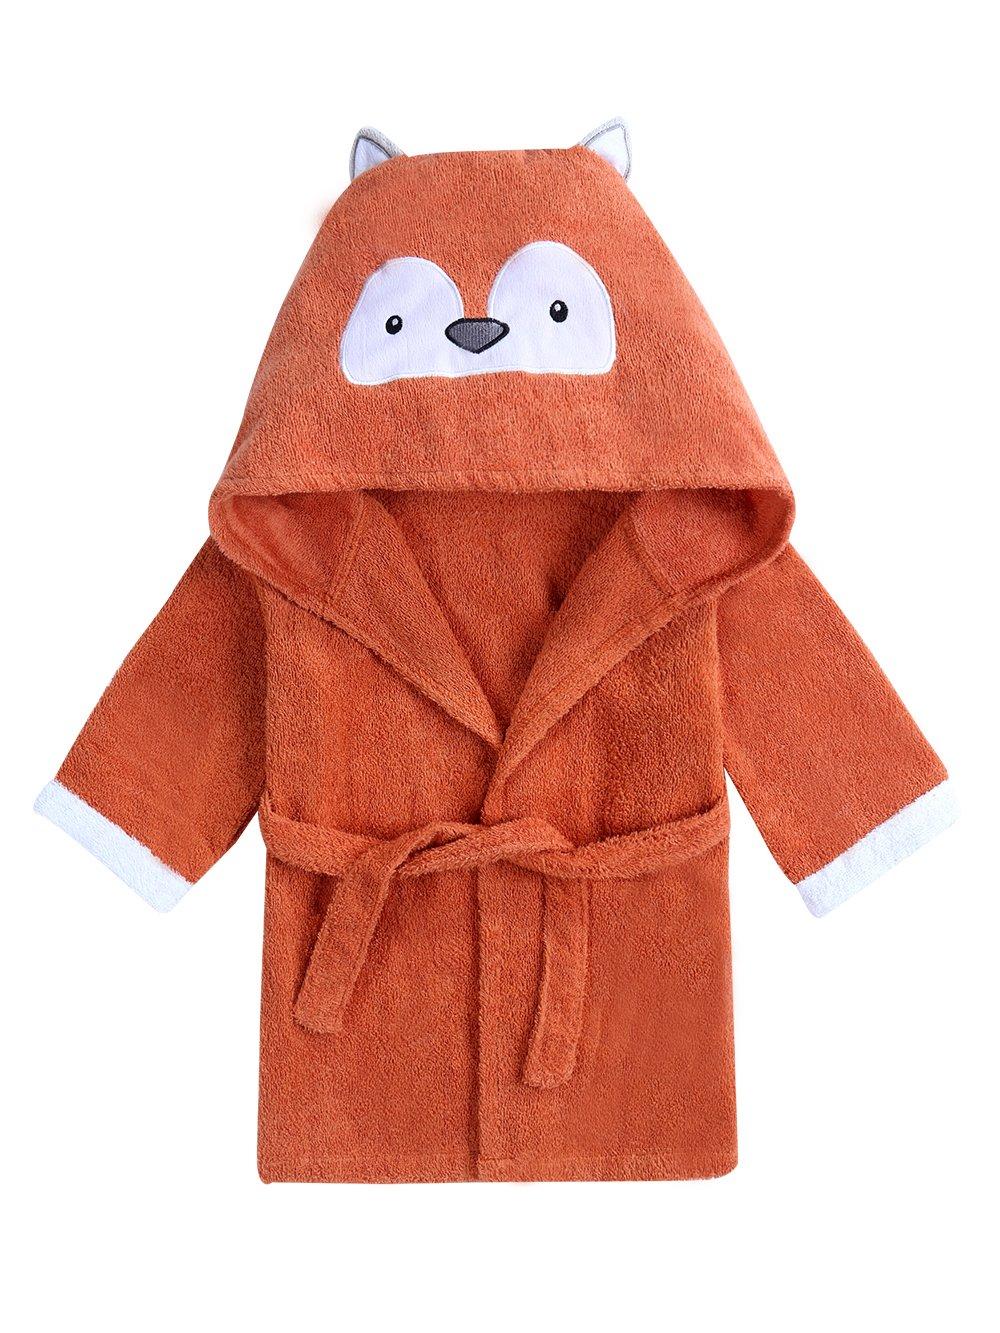 URBEAR Baby Hooded Bathrobe & Towel Bath Robe Shower Gift Present 12-36 Months, Fox M